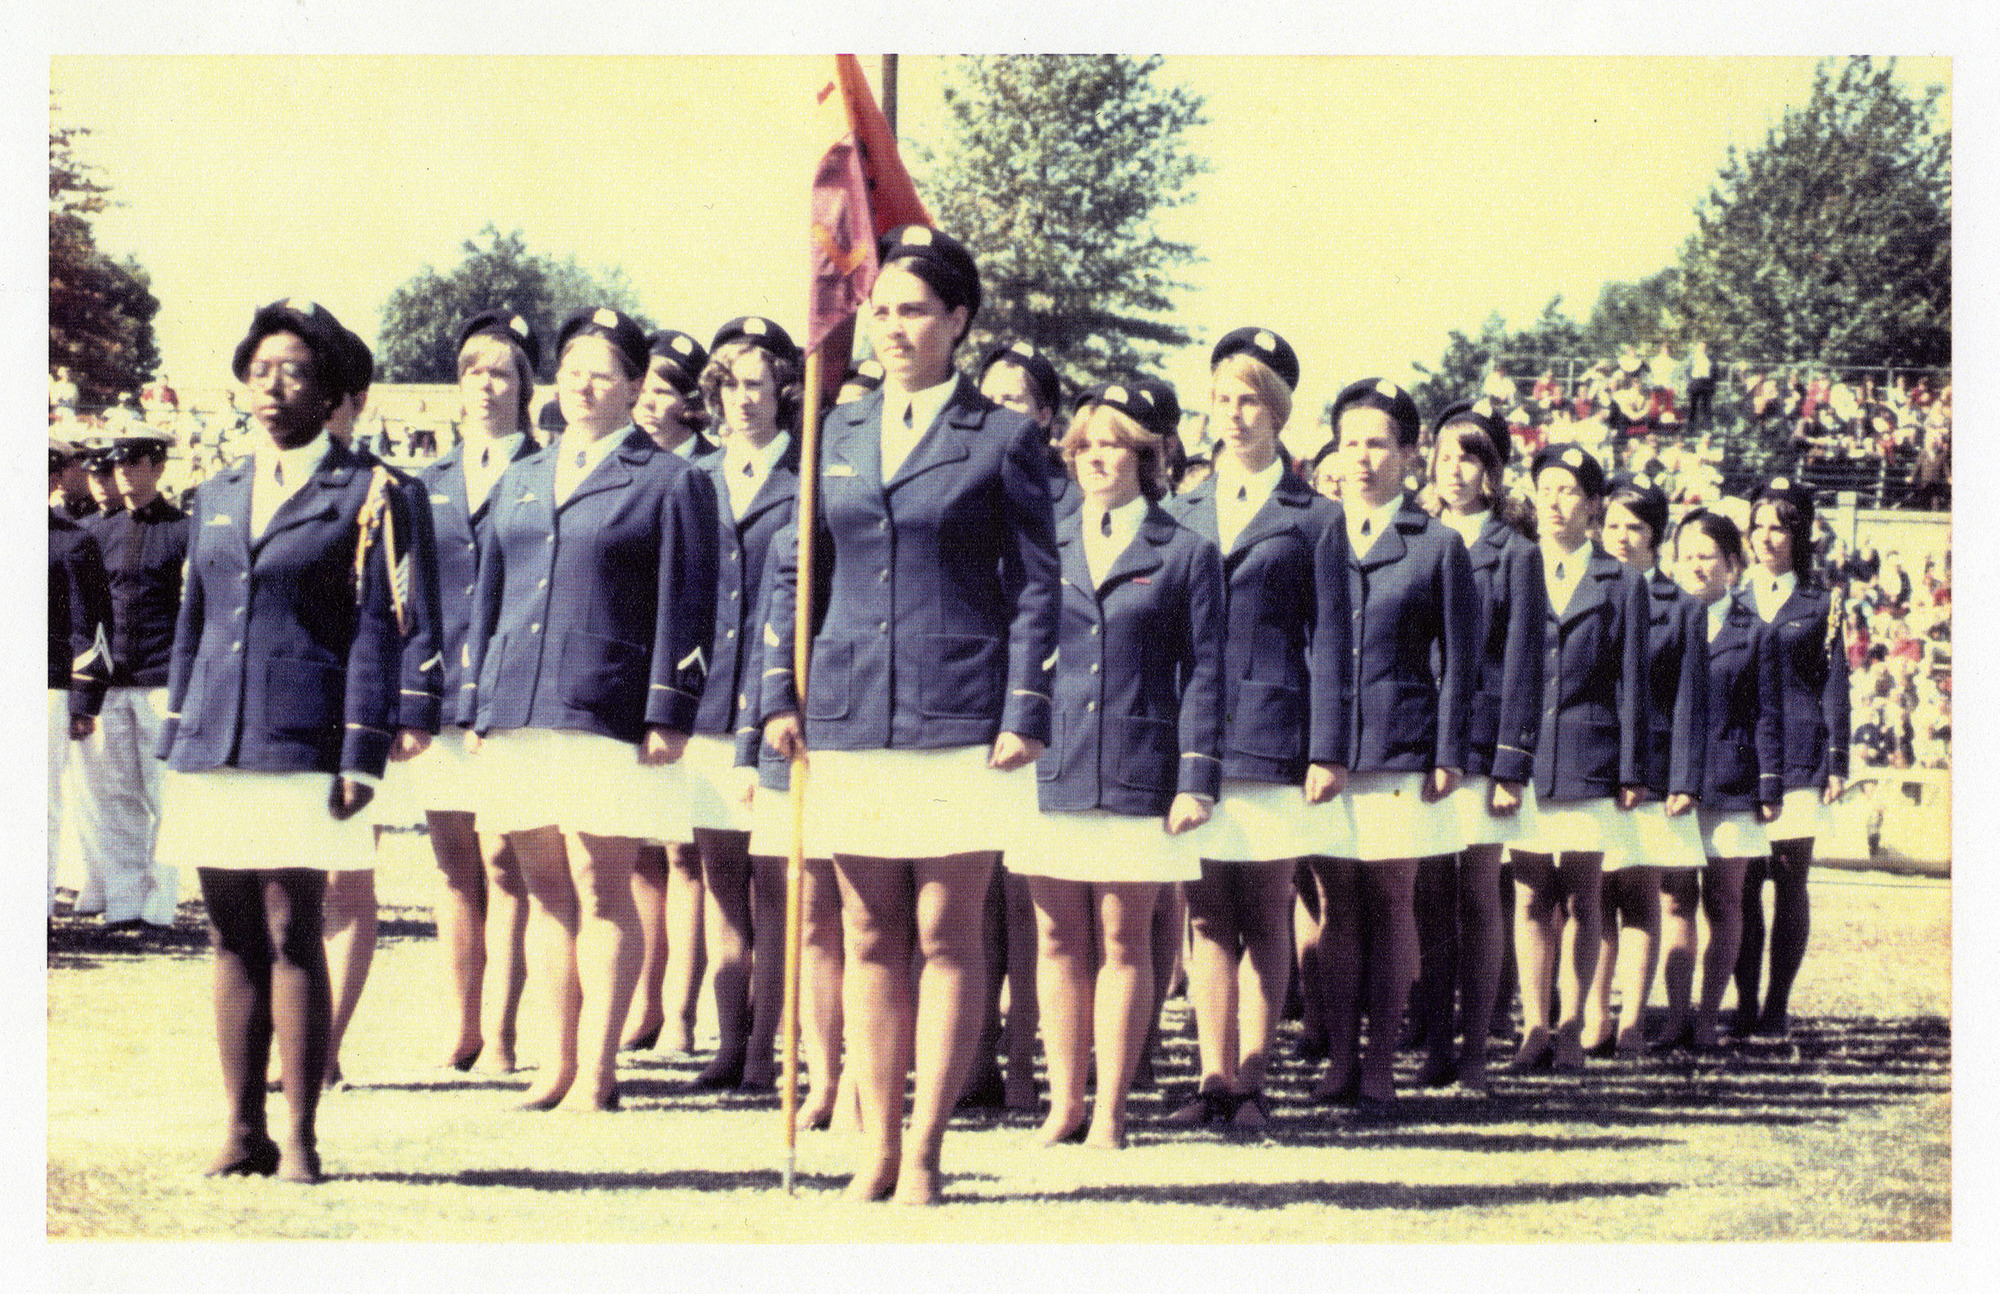 CorpsWomen_001_c1973.jpg